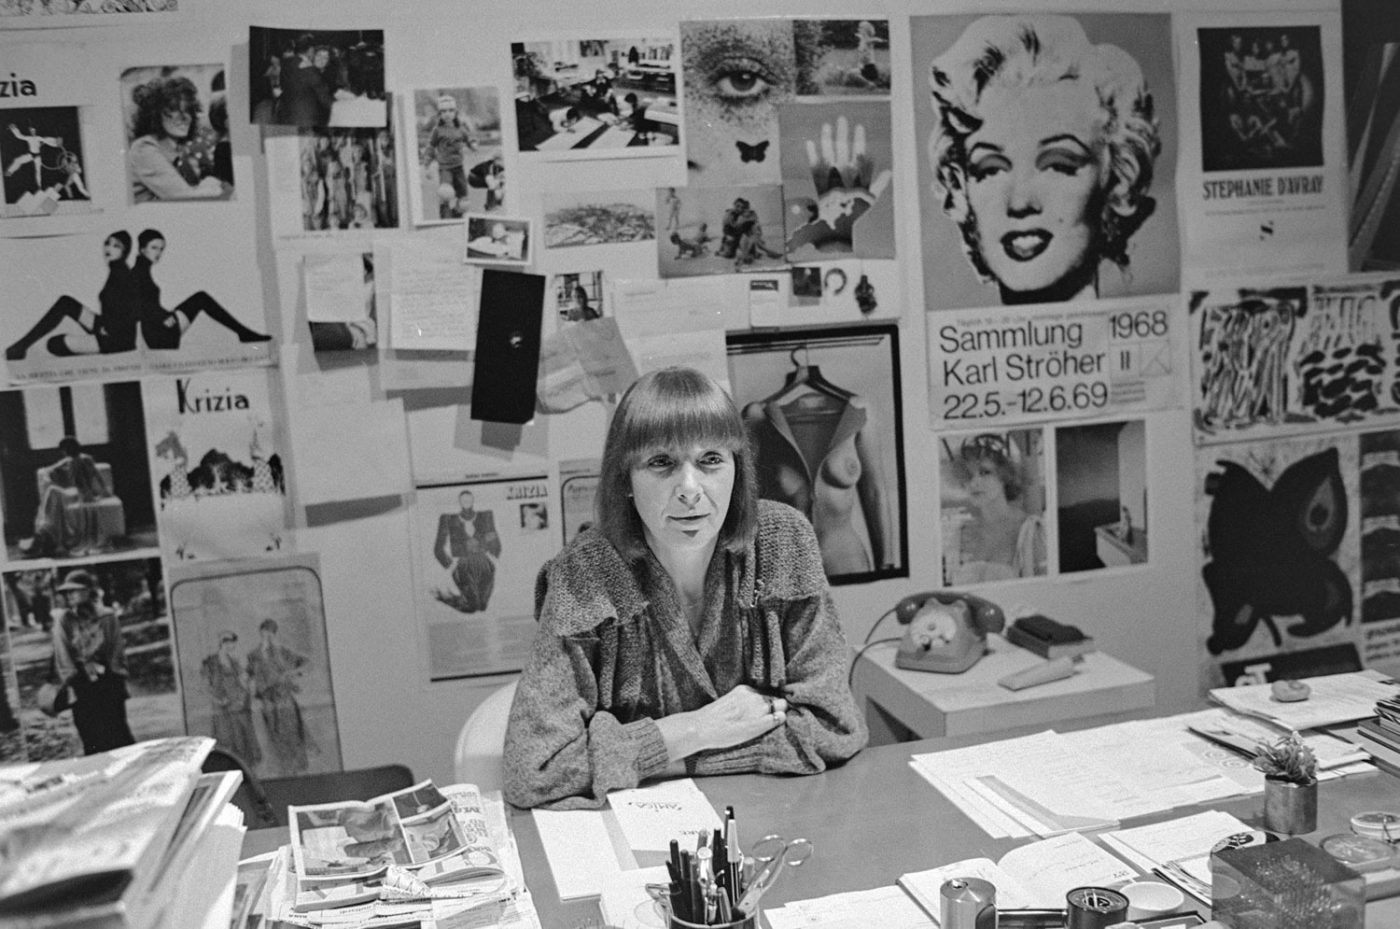 Mariuccia Mandelli a.k.a. Krizia Italian fashion designer